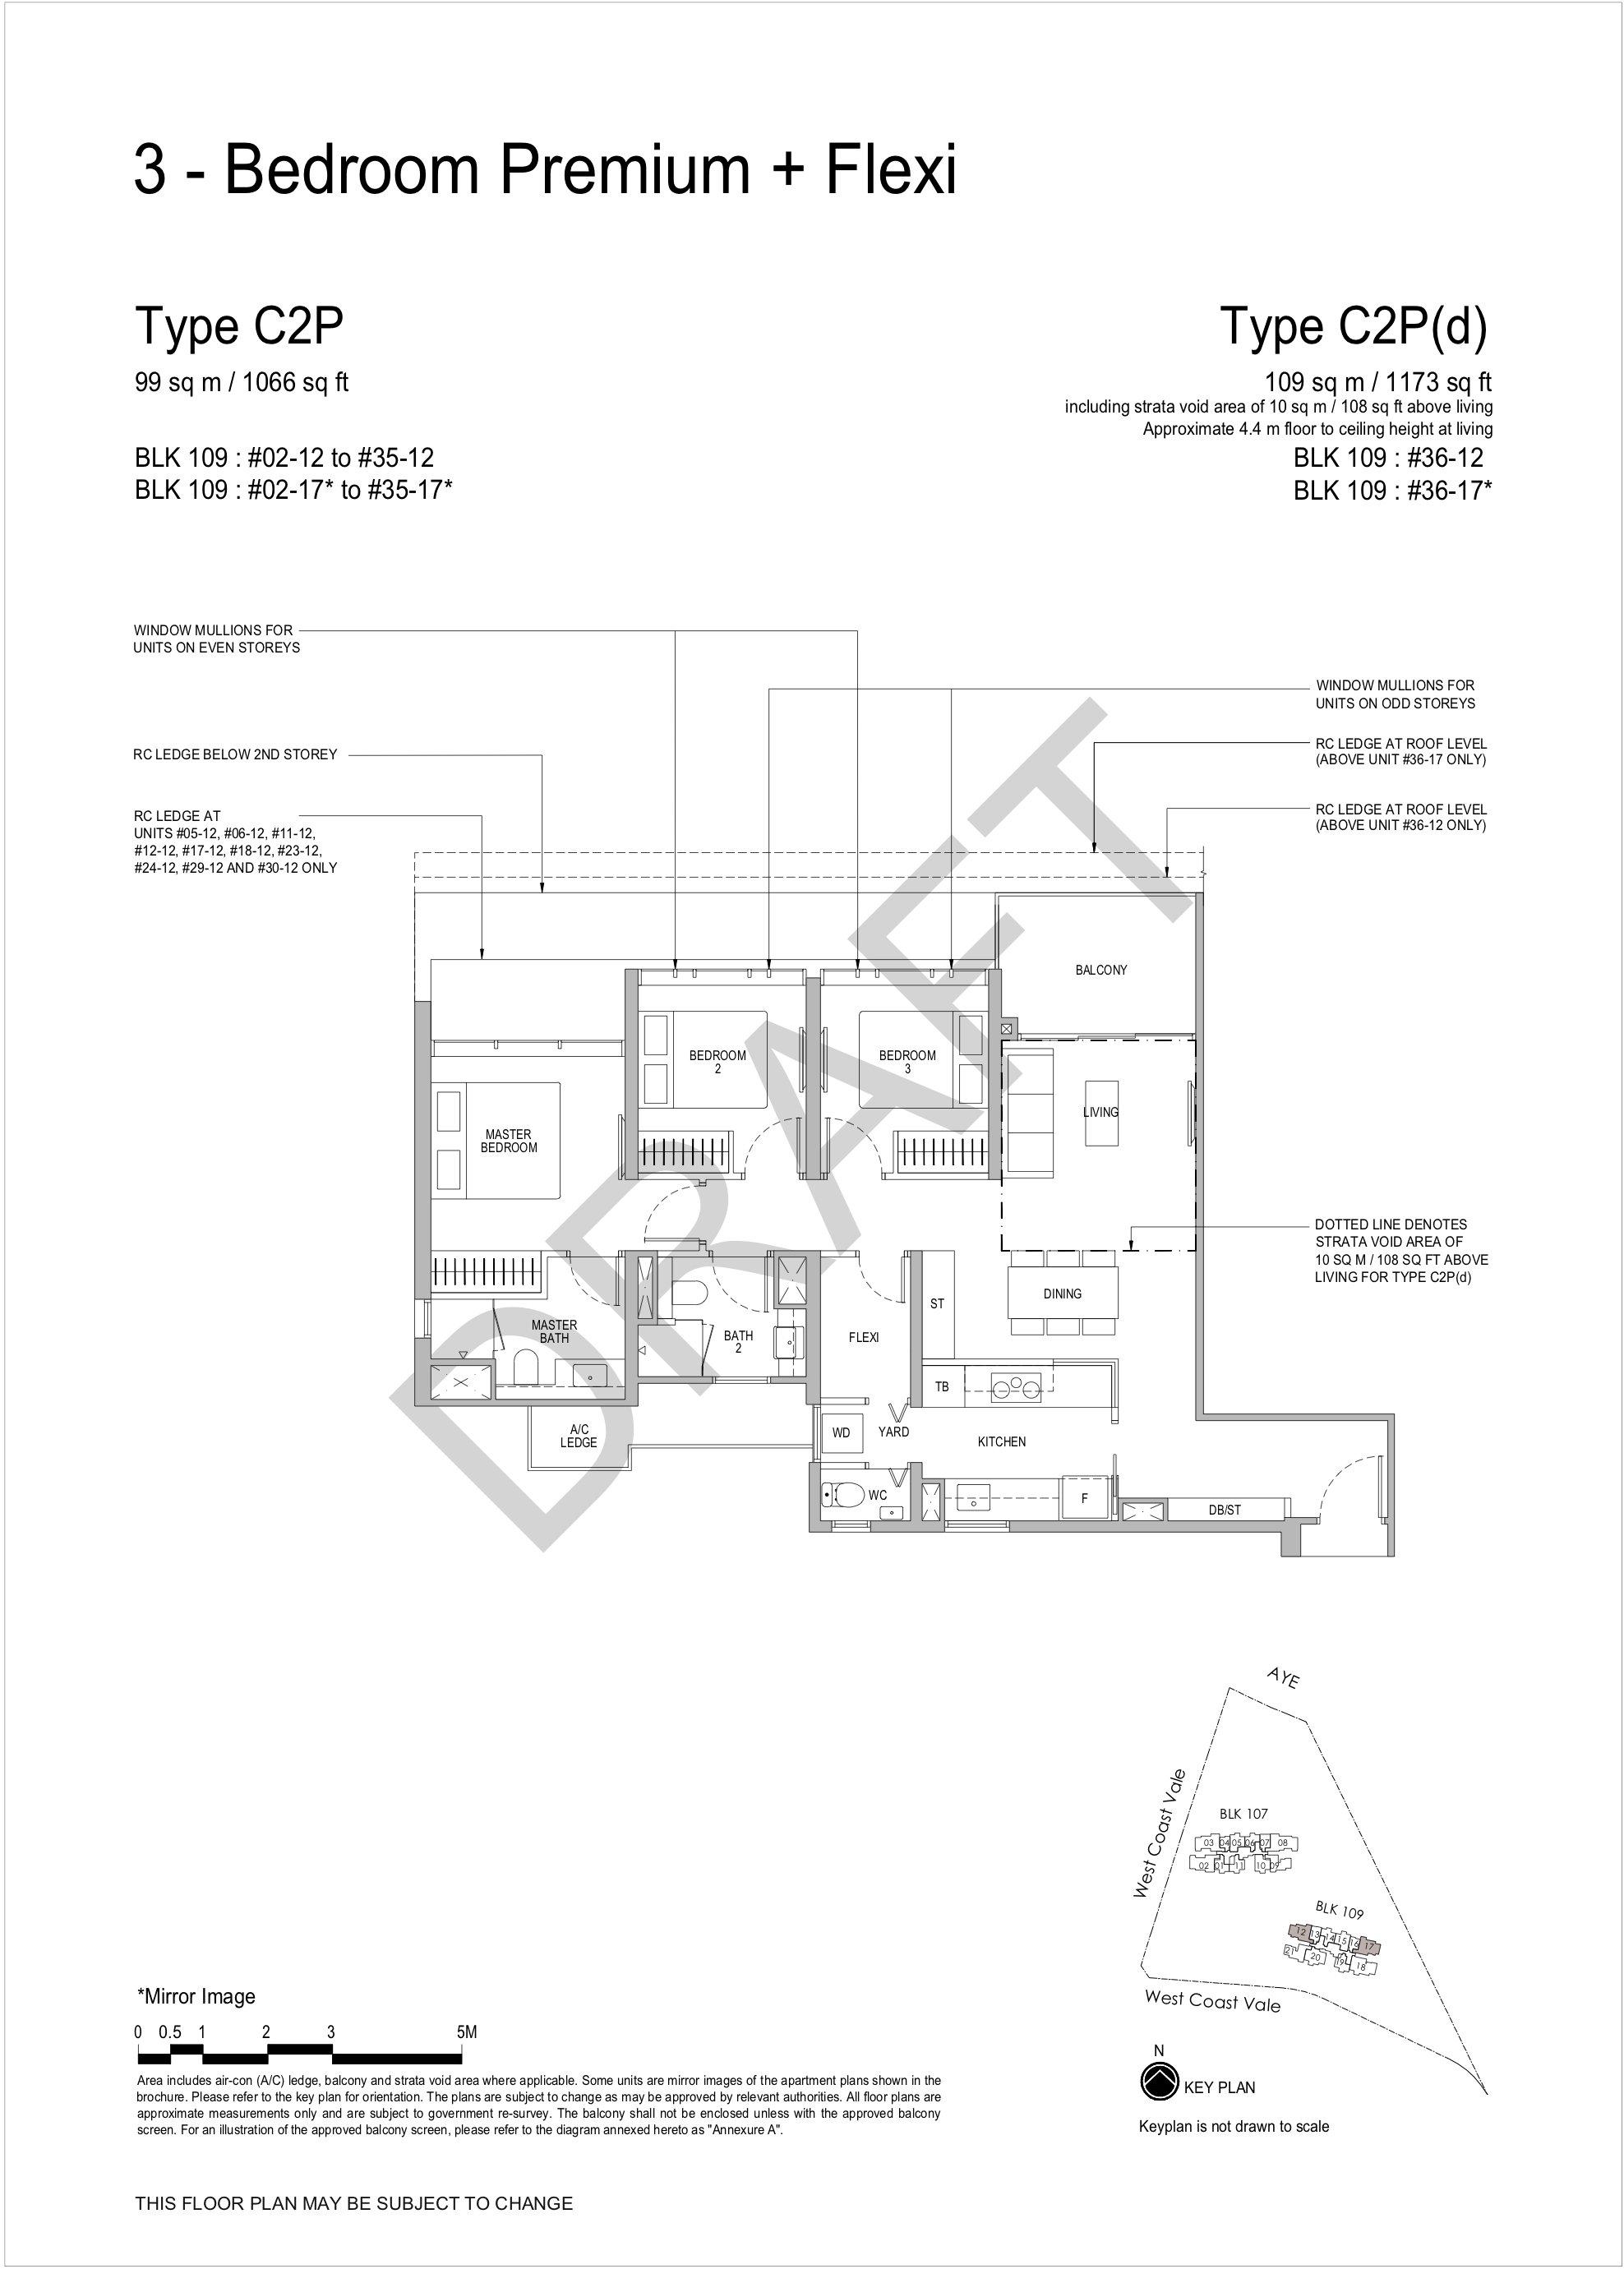 Whistler Grand 3 bedroom premium flexi floor plan C2P